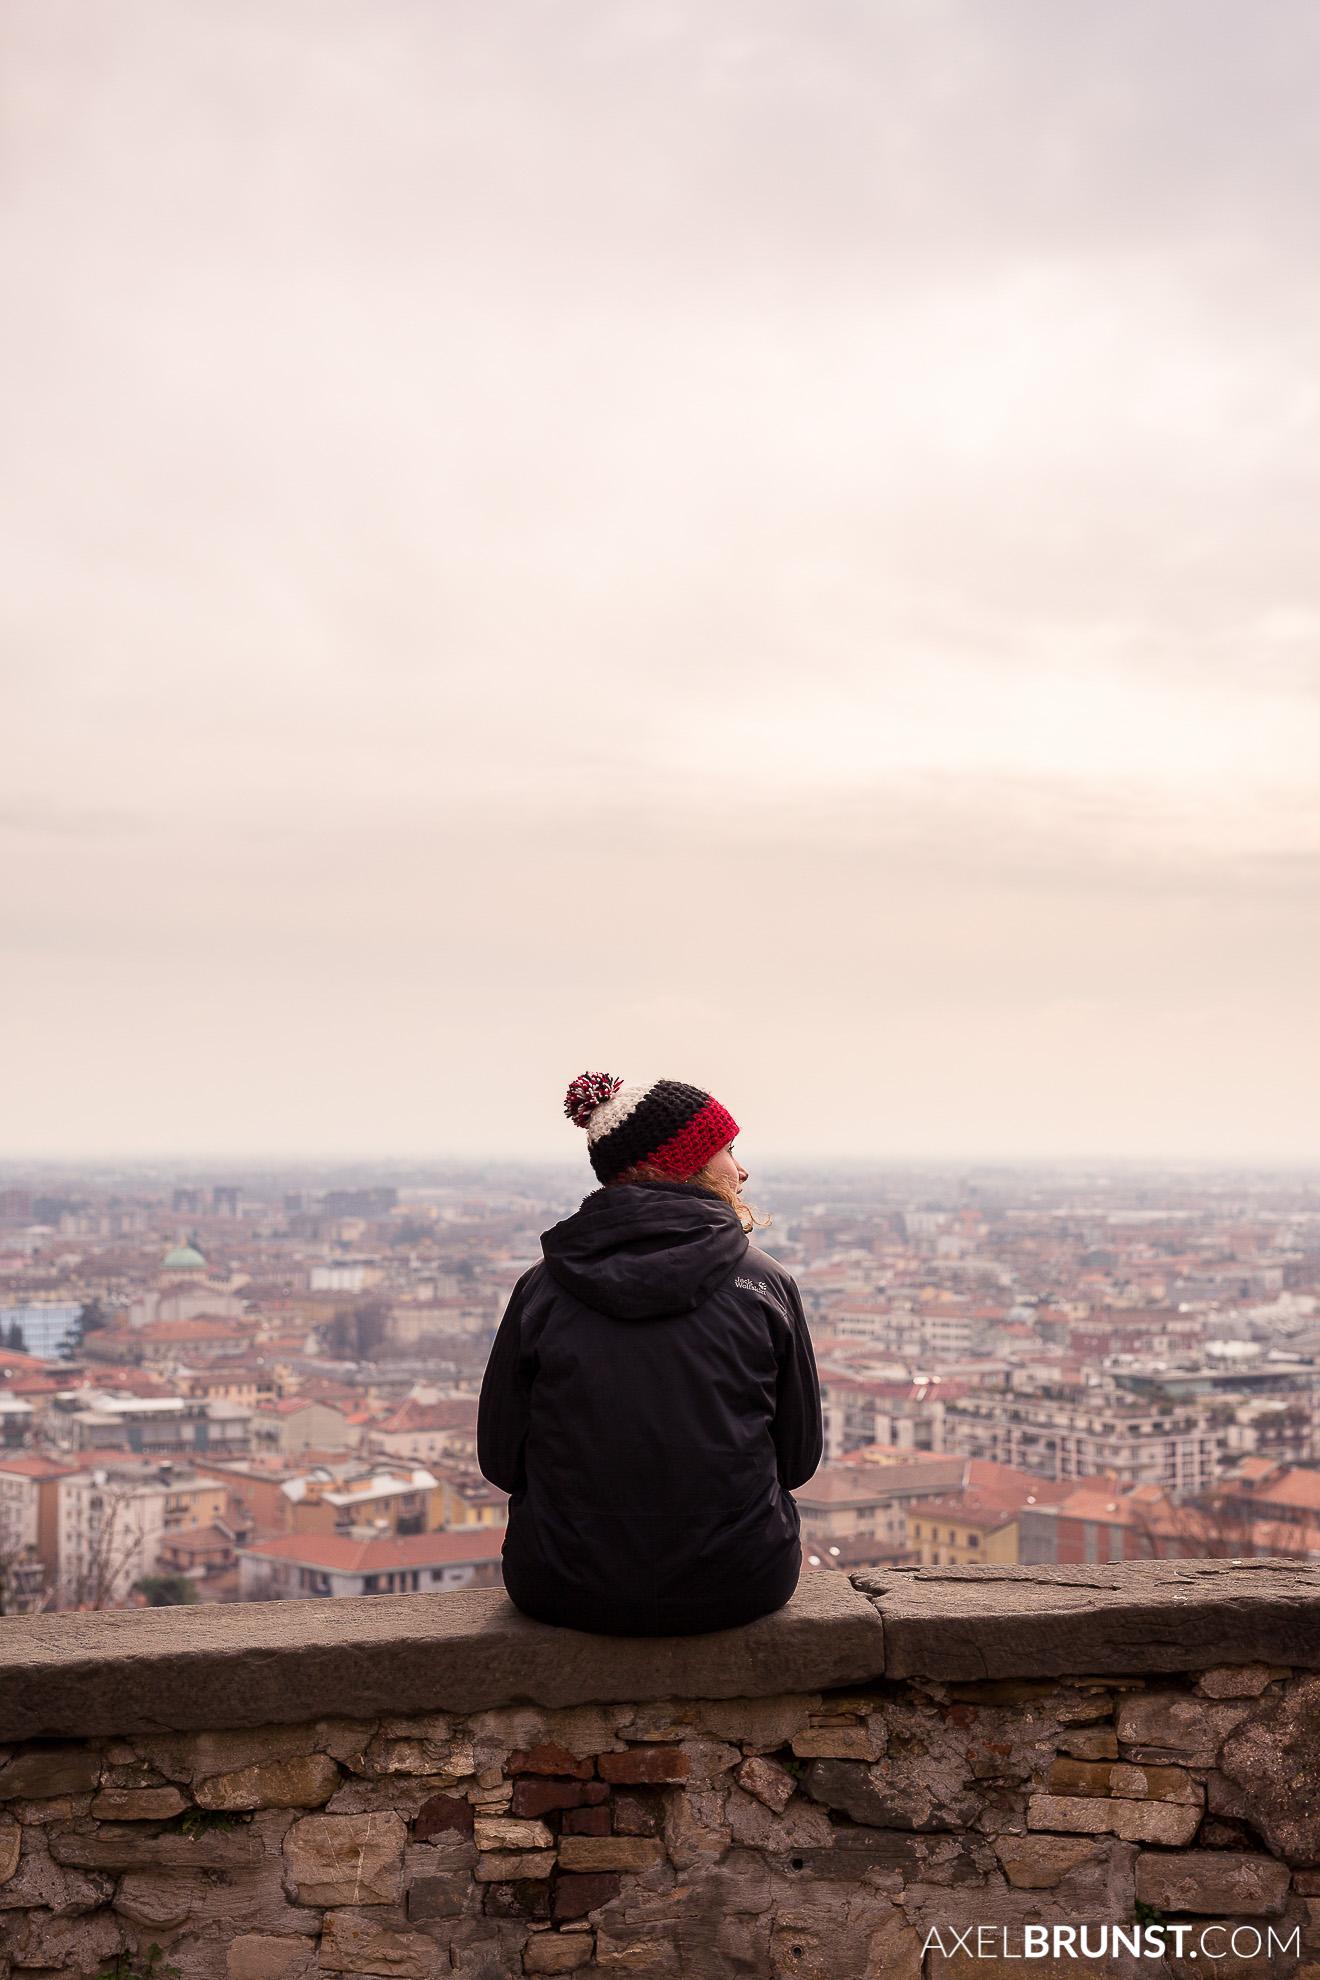 bergamo-italy-travel-photography-3.jpg